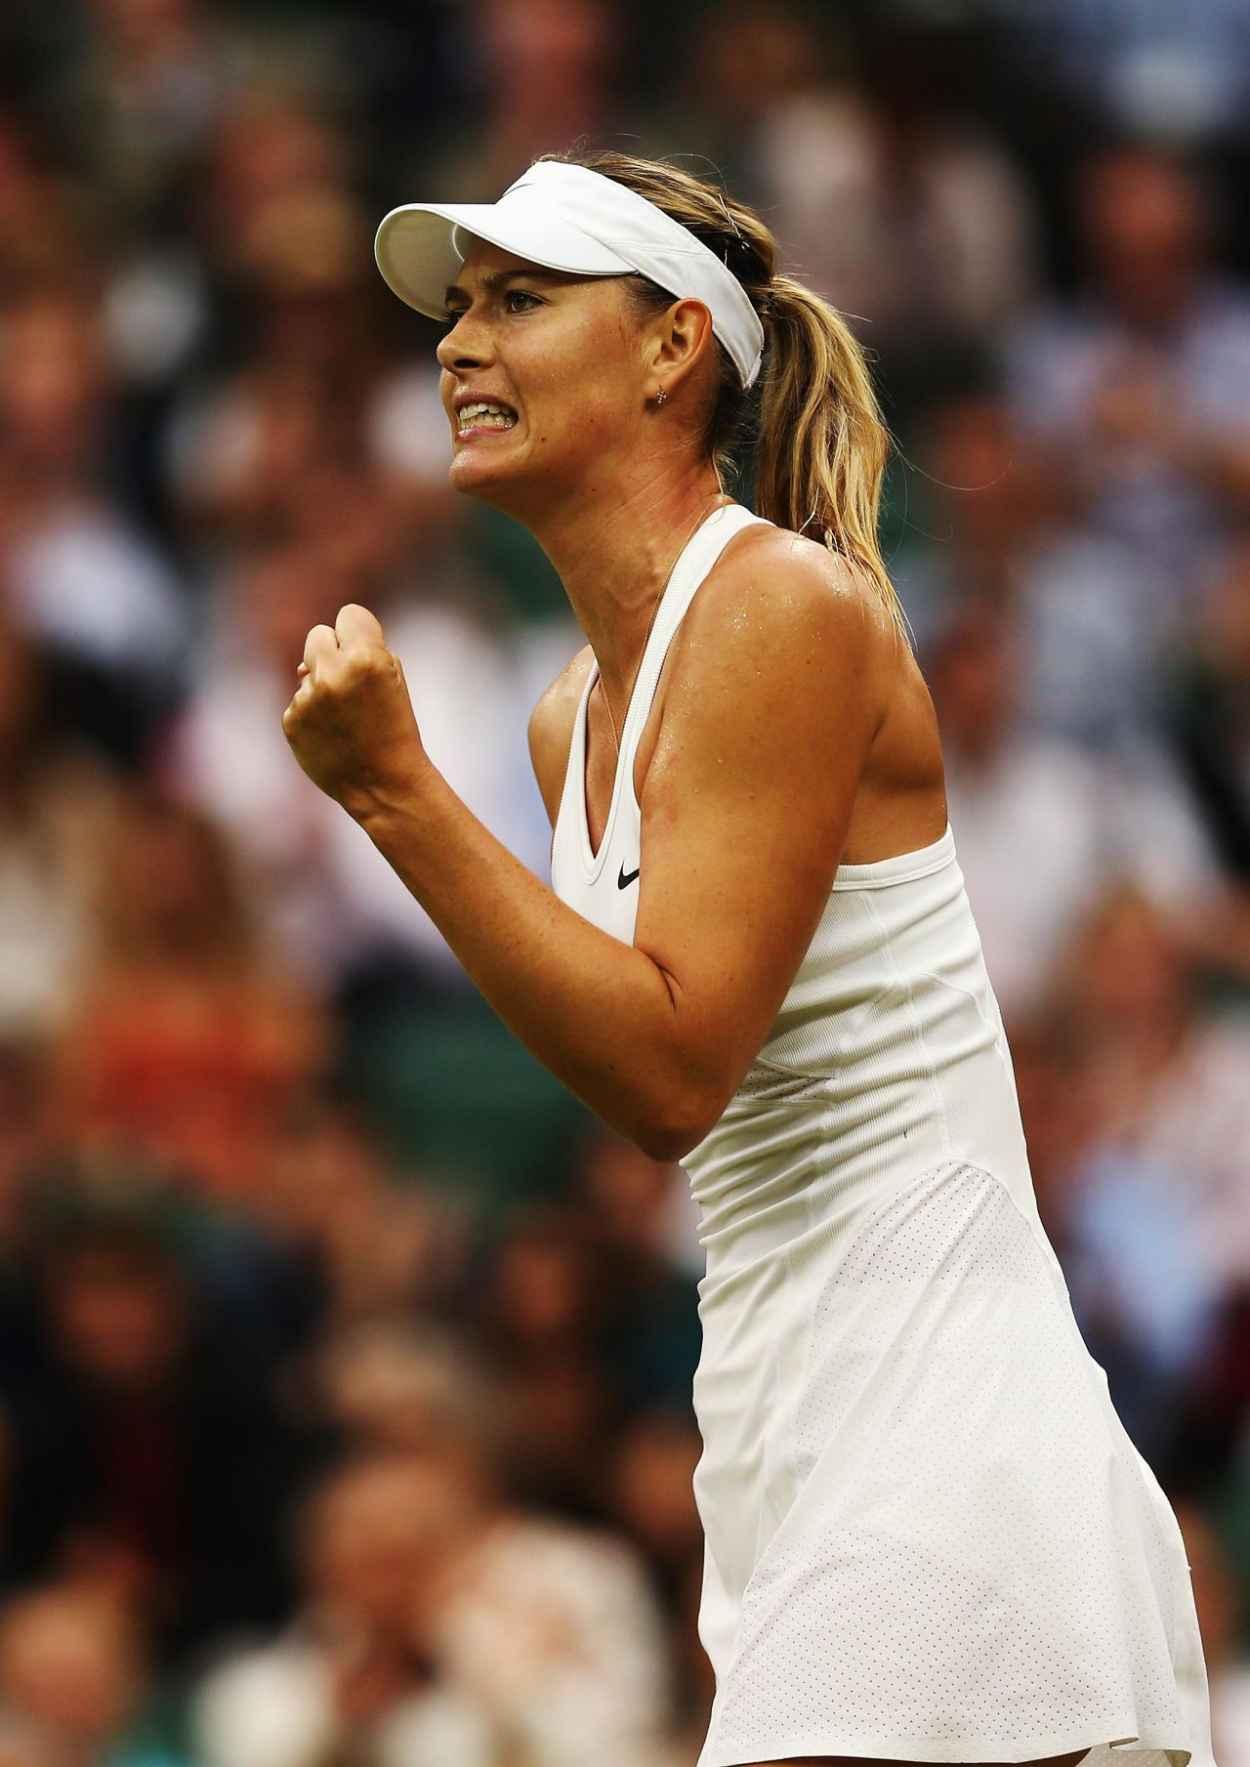 Pin by Alan Ligameri on Z-Maria Sharpova in 2020 | Tennis